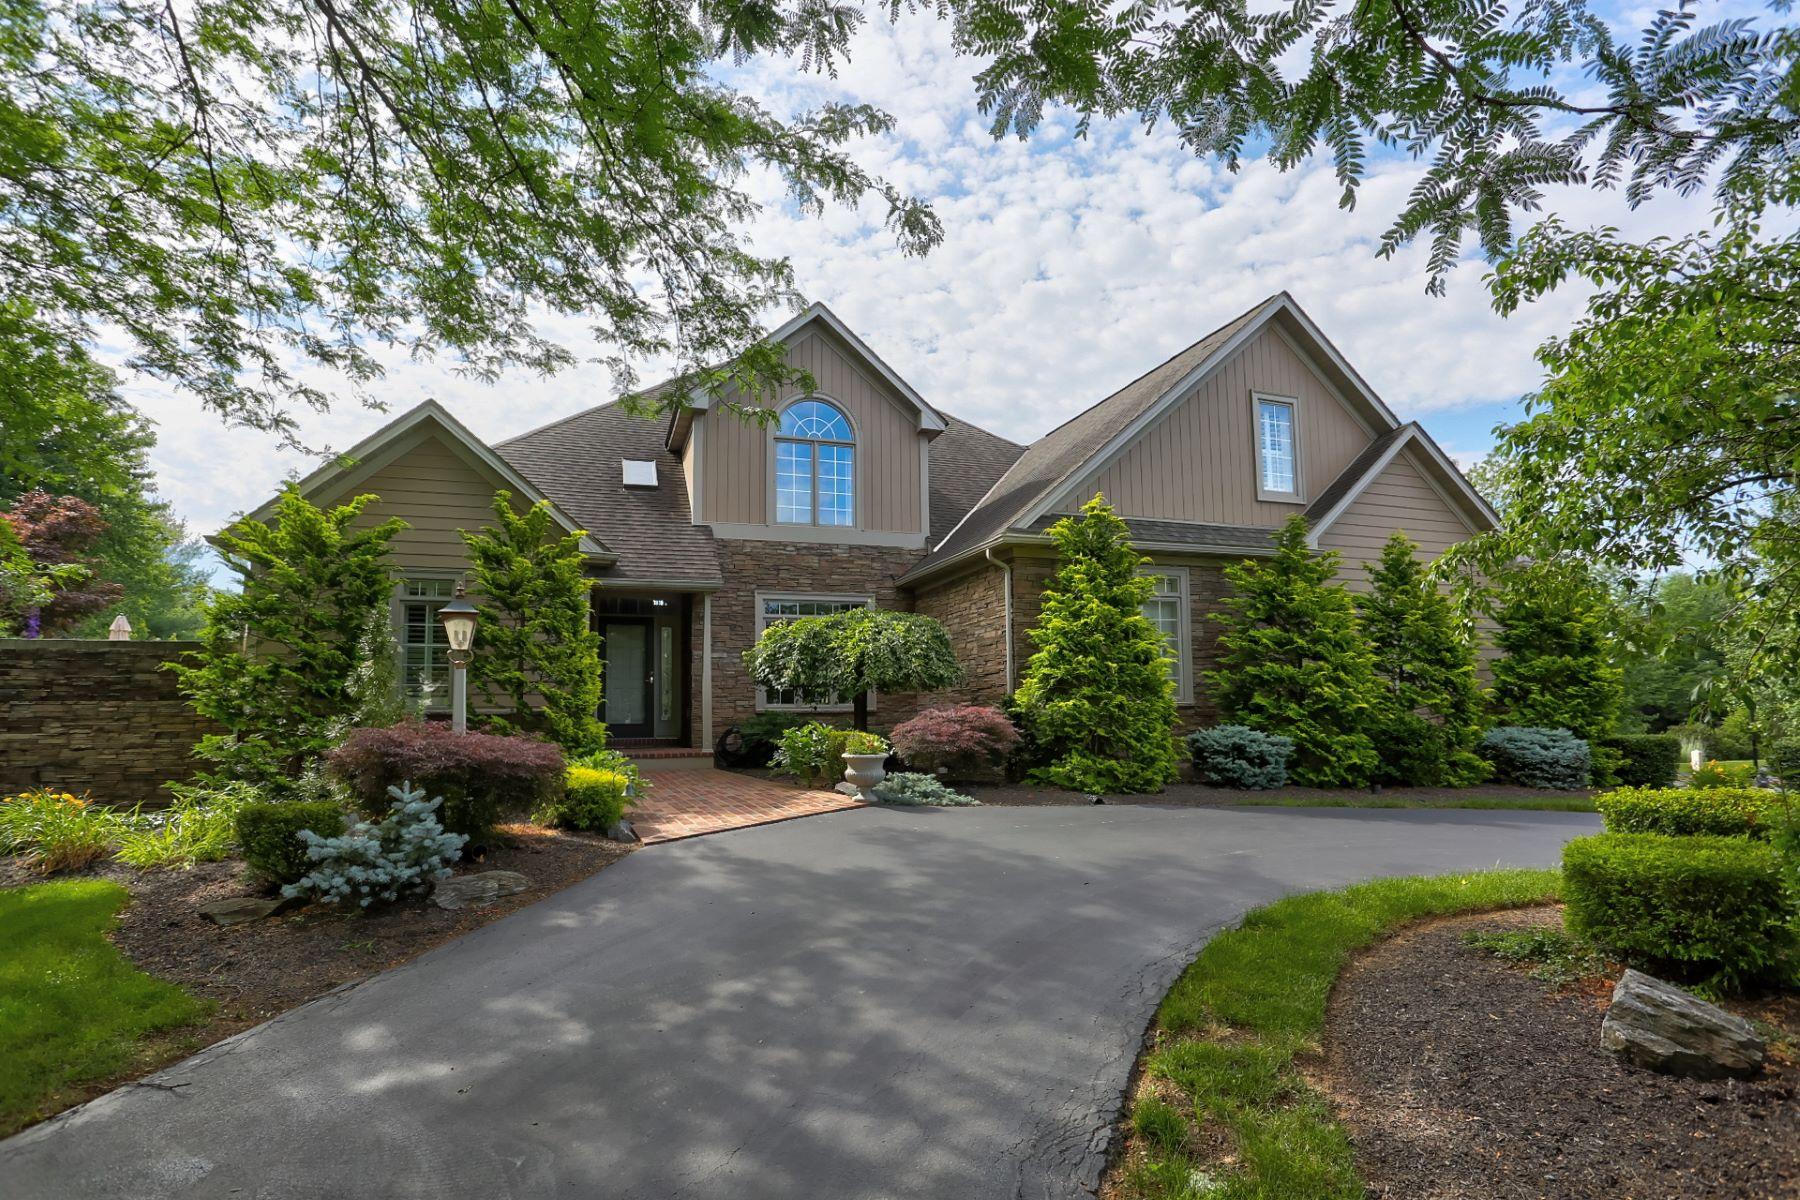 Single Family Home for Sale at 354 N Farm Drive Lititz, Pennsylvania, 17543 United States